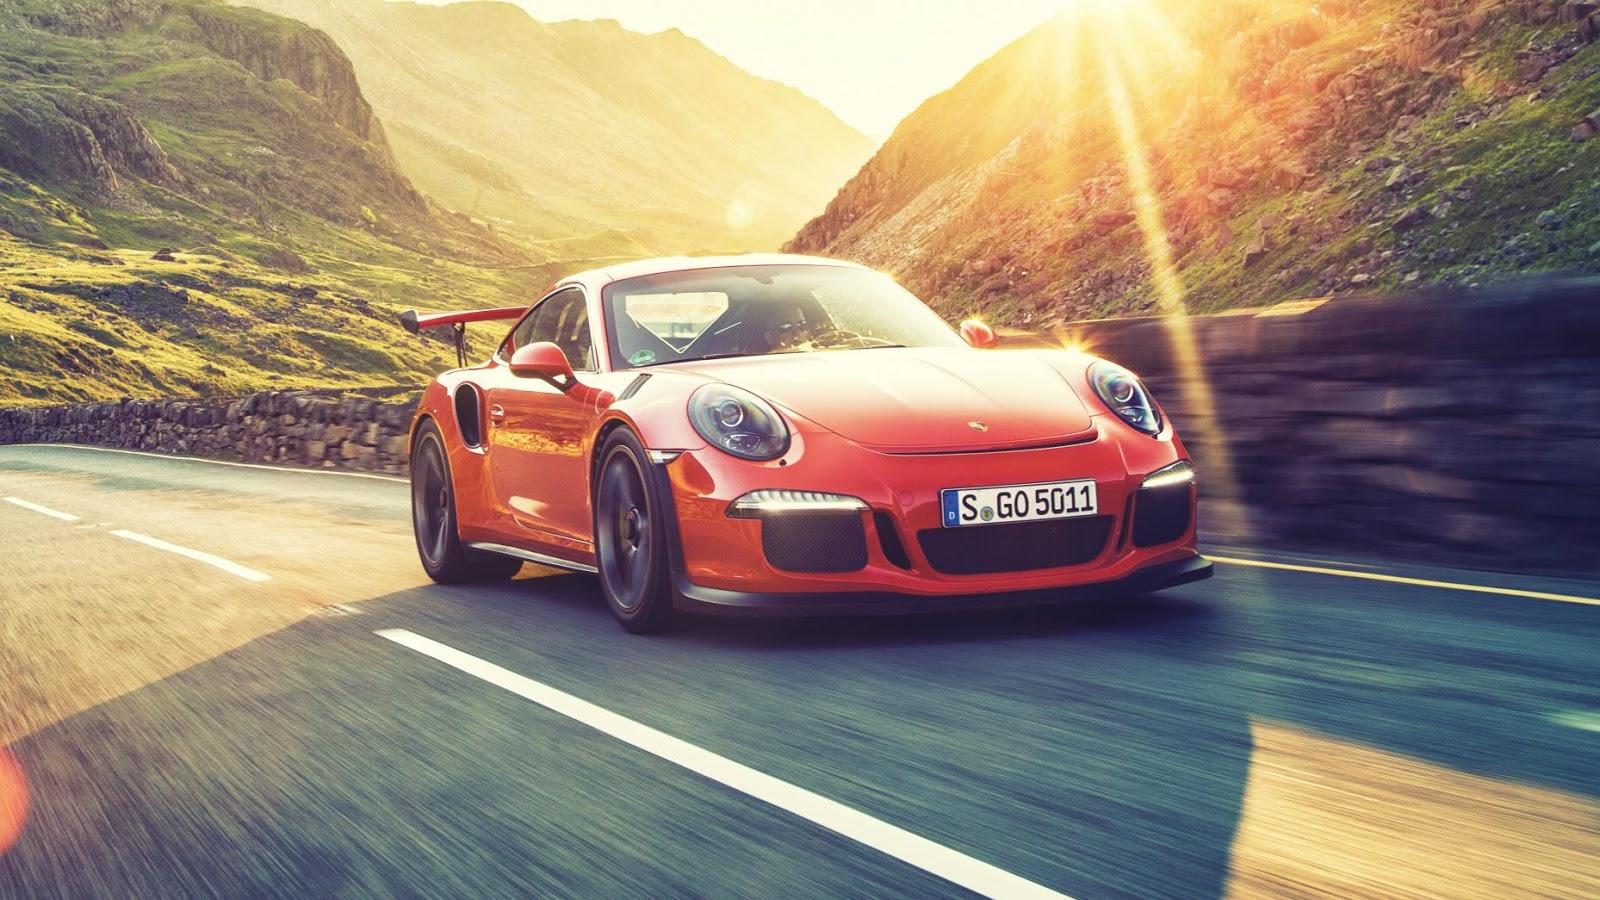 Porsche 911 GT3 RS - 3,3 giây